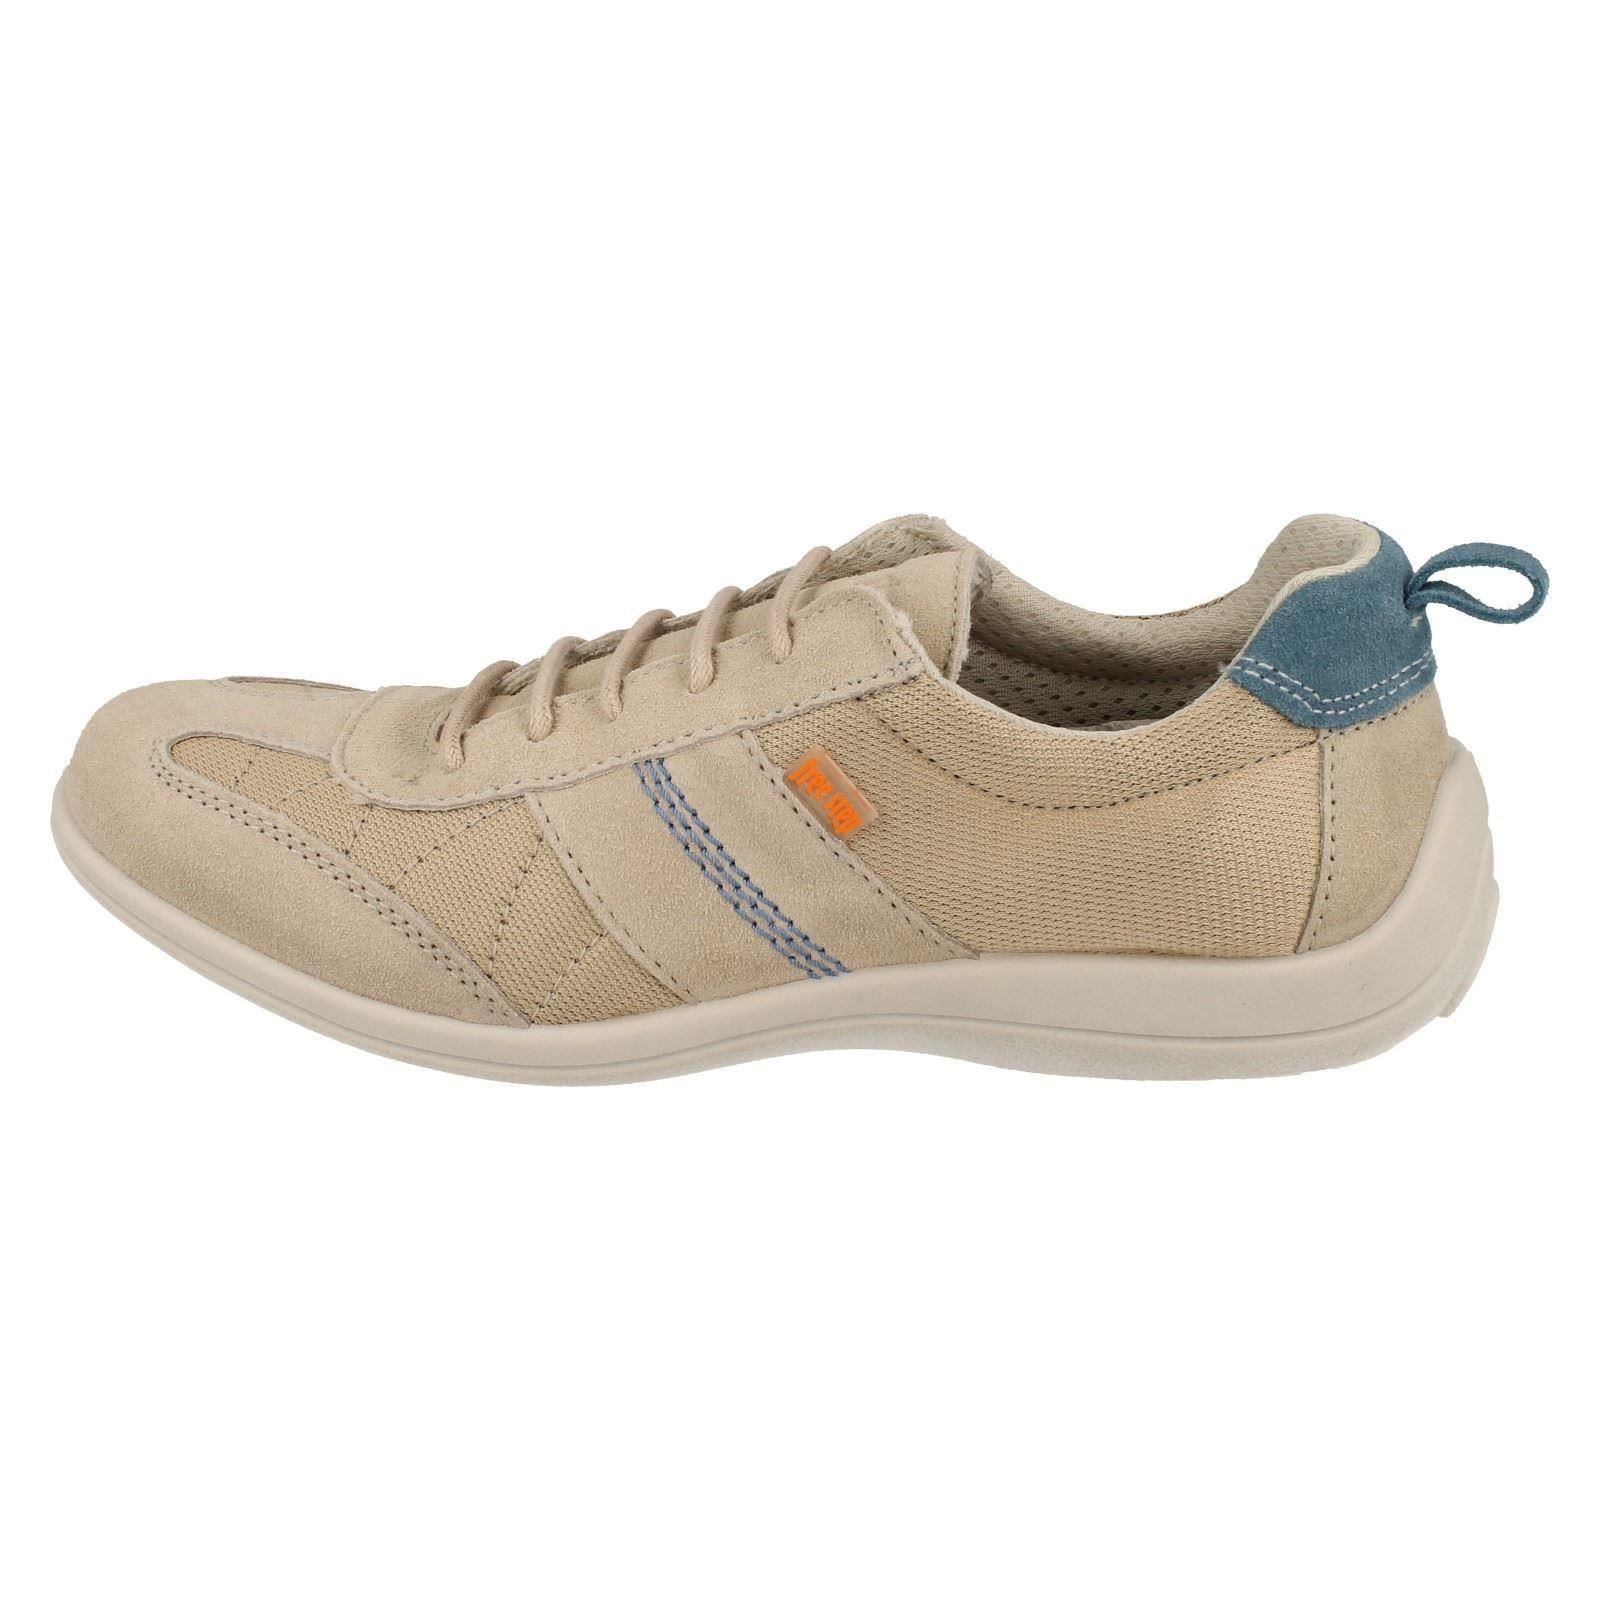 Freestep Size  Shoes